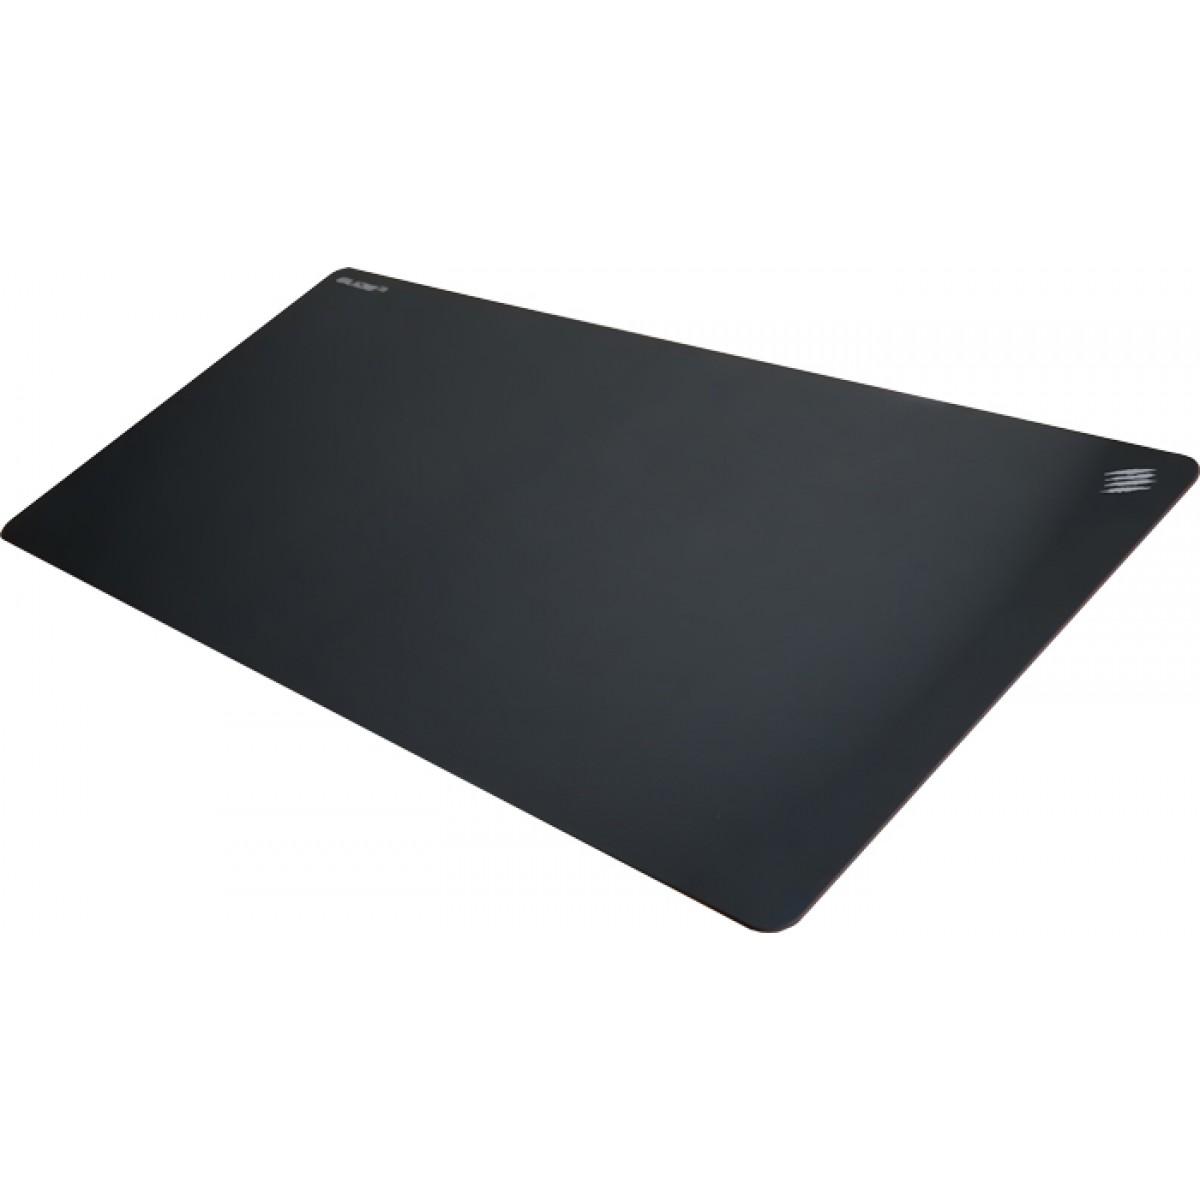 Mousepad Gamer Mad Catz Glide 38, Grande, Black, SGSSNS38BL01